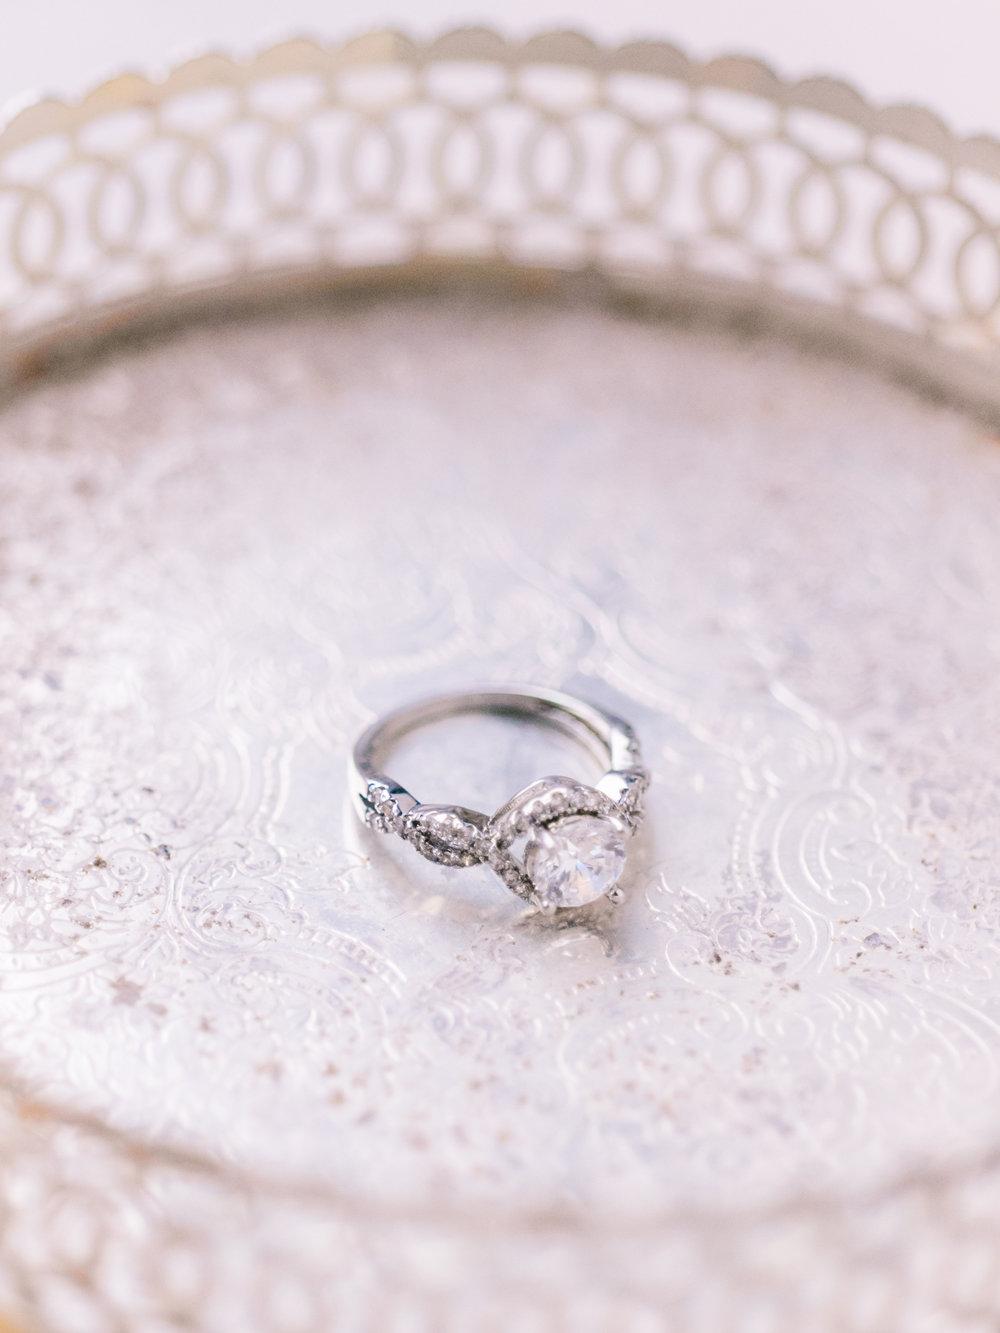 Elegant Organic Fall Swedish Bridal Wedding Styled Shoot - Erika Alvarenga Photography-79.jpg